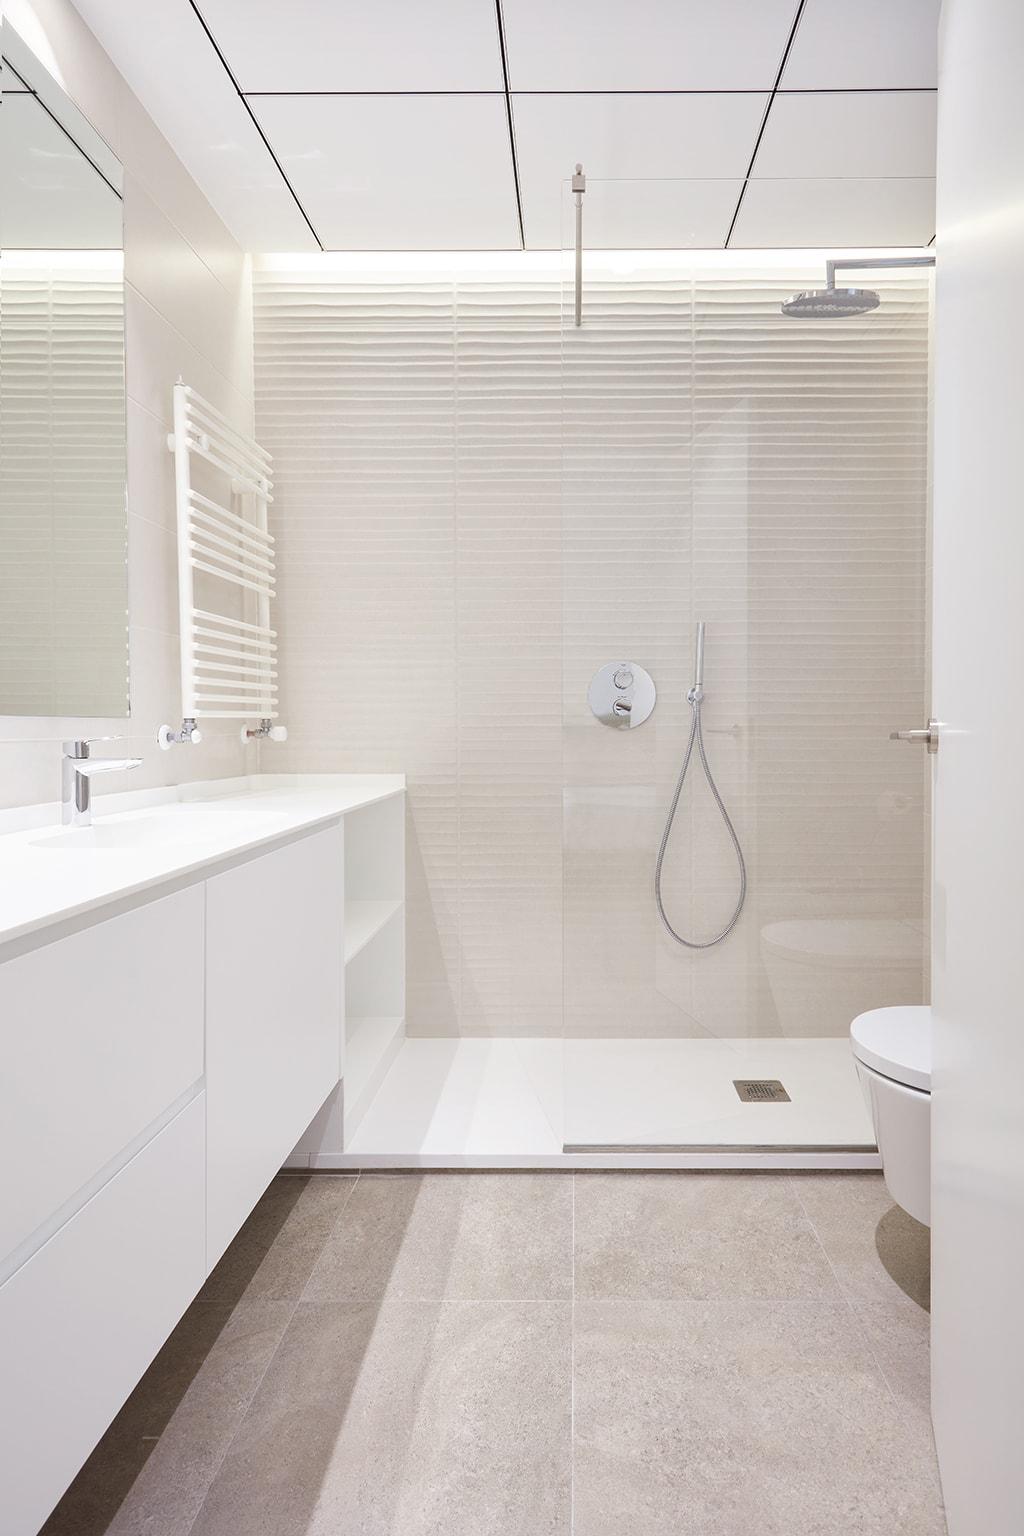 setrabe arquitectura valencia. reforma vivienda en ruzafa. Pavimento CERACASA (modelo orion Stone natural 60x60)